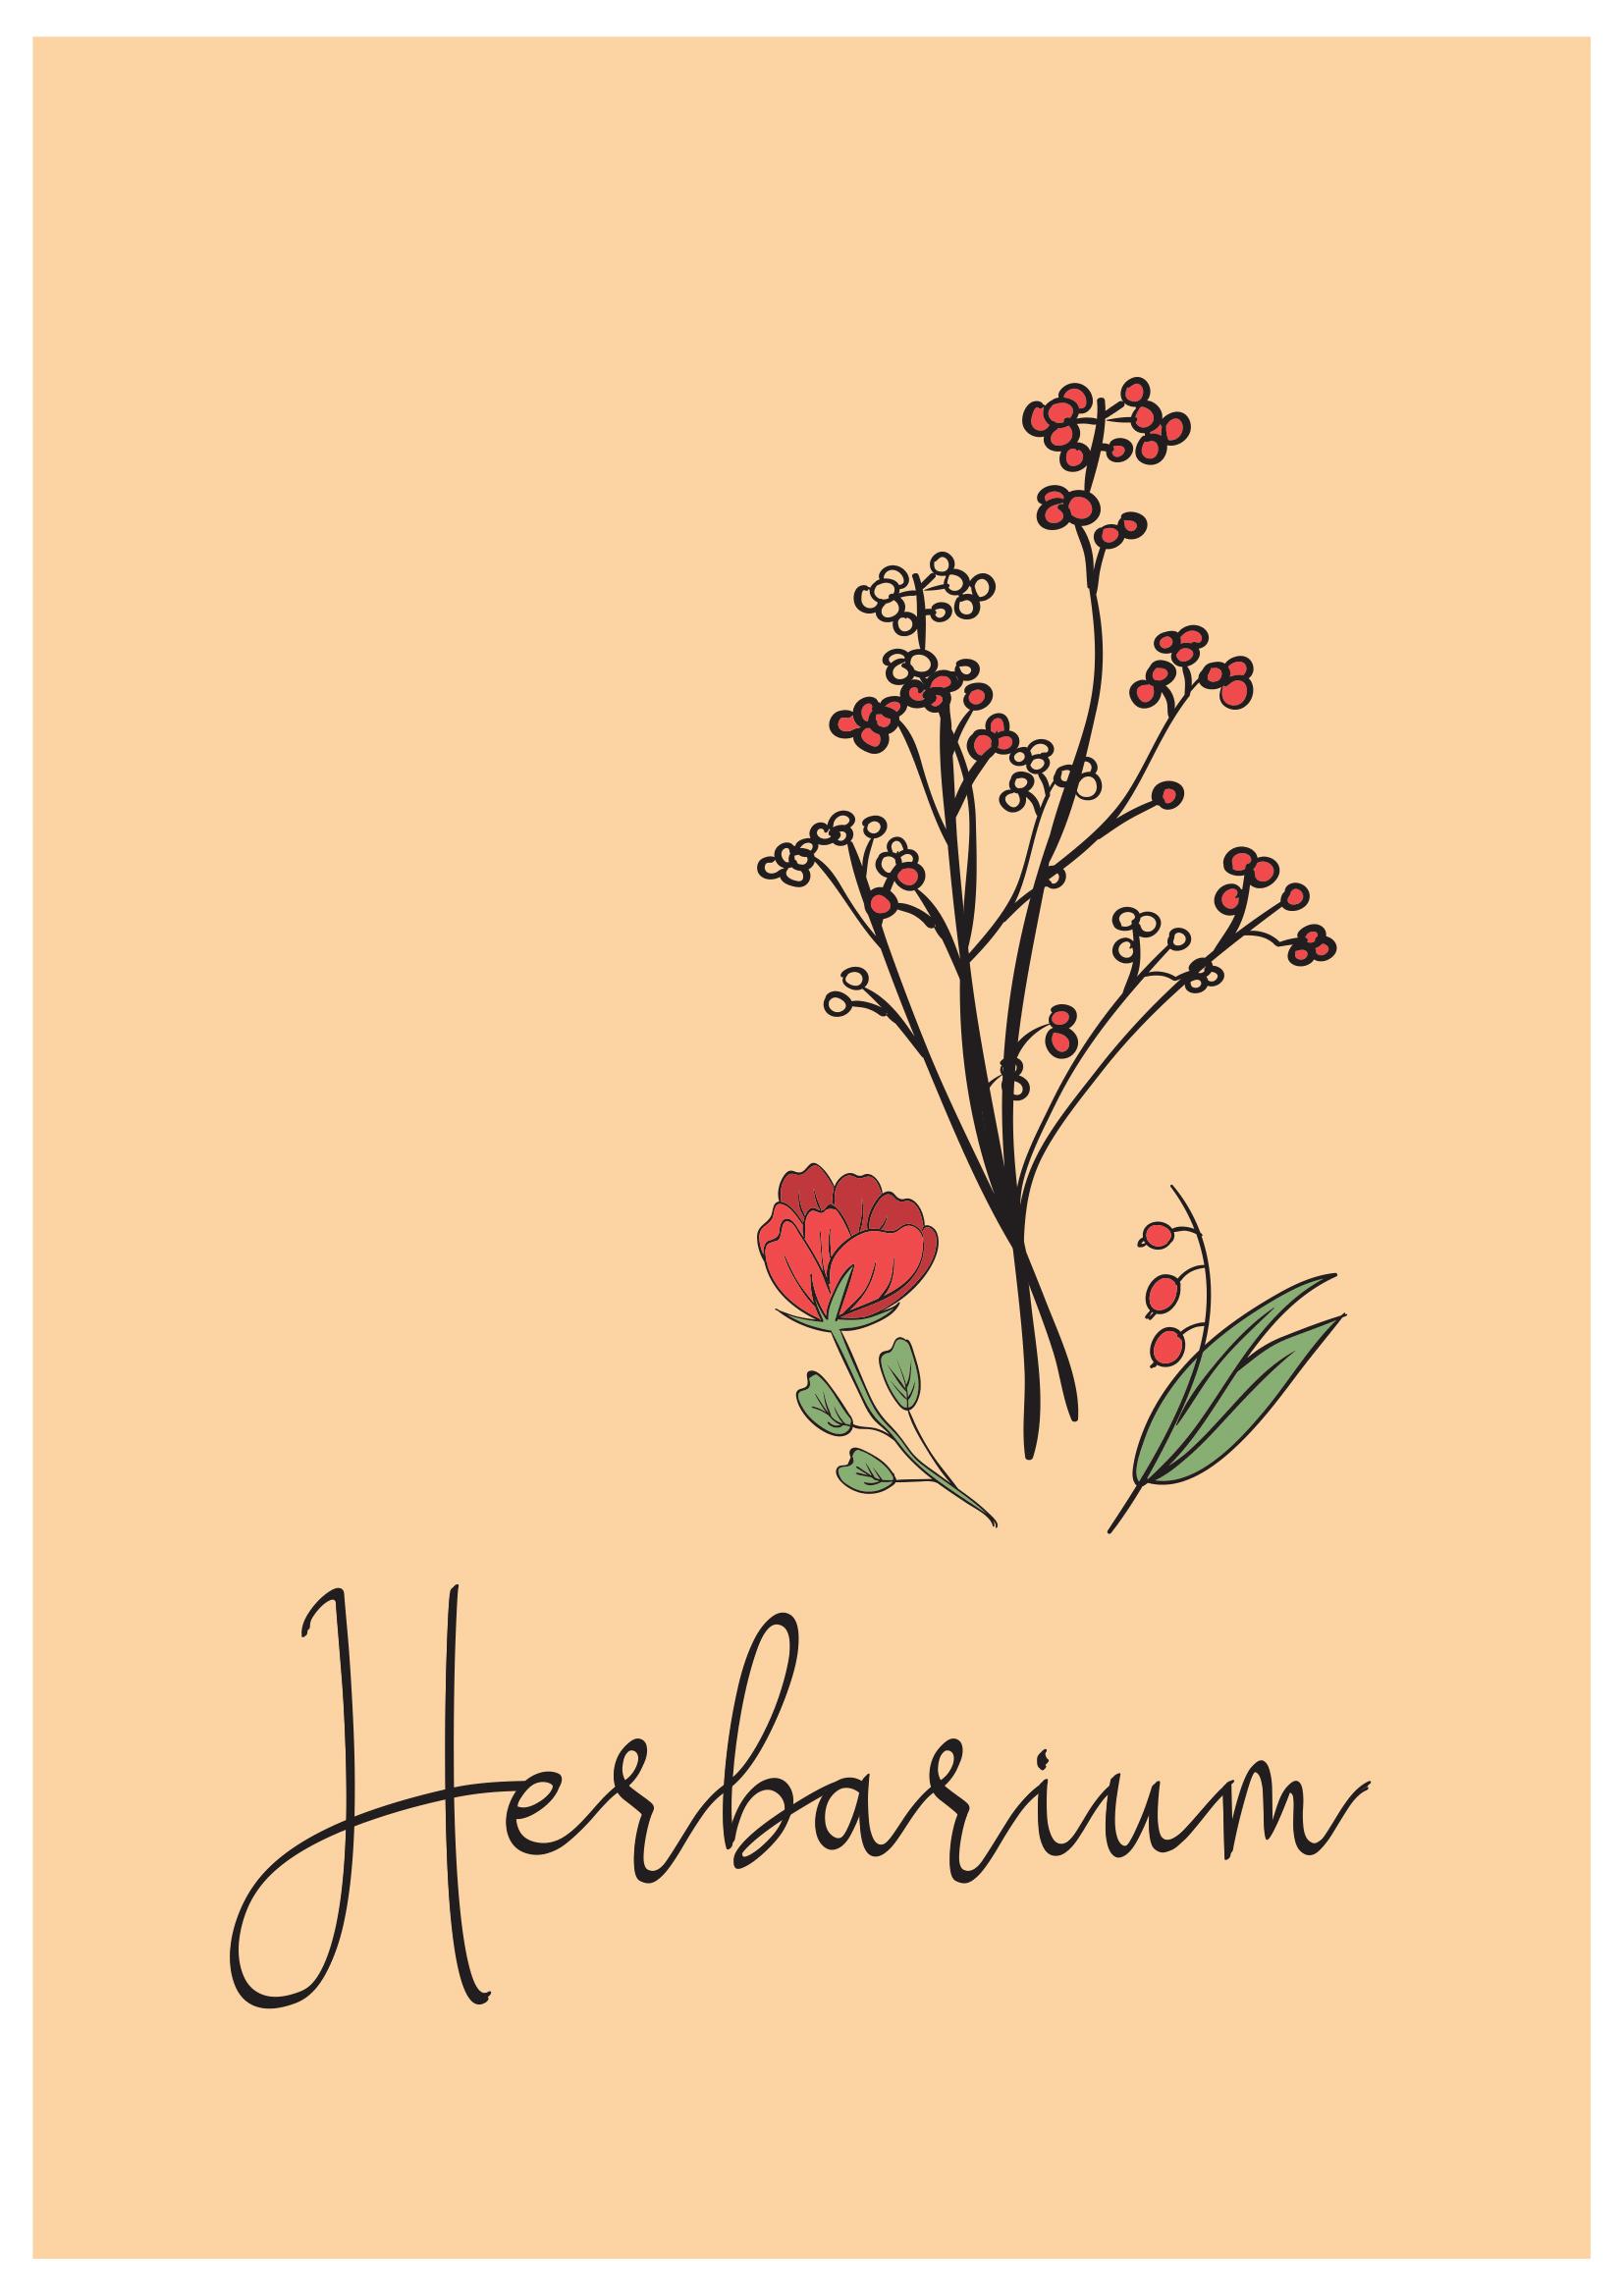 Deckblatt Herbarium 1 Deckblatt Deckblatt Schule Herbarium Vorlage